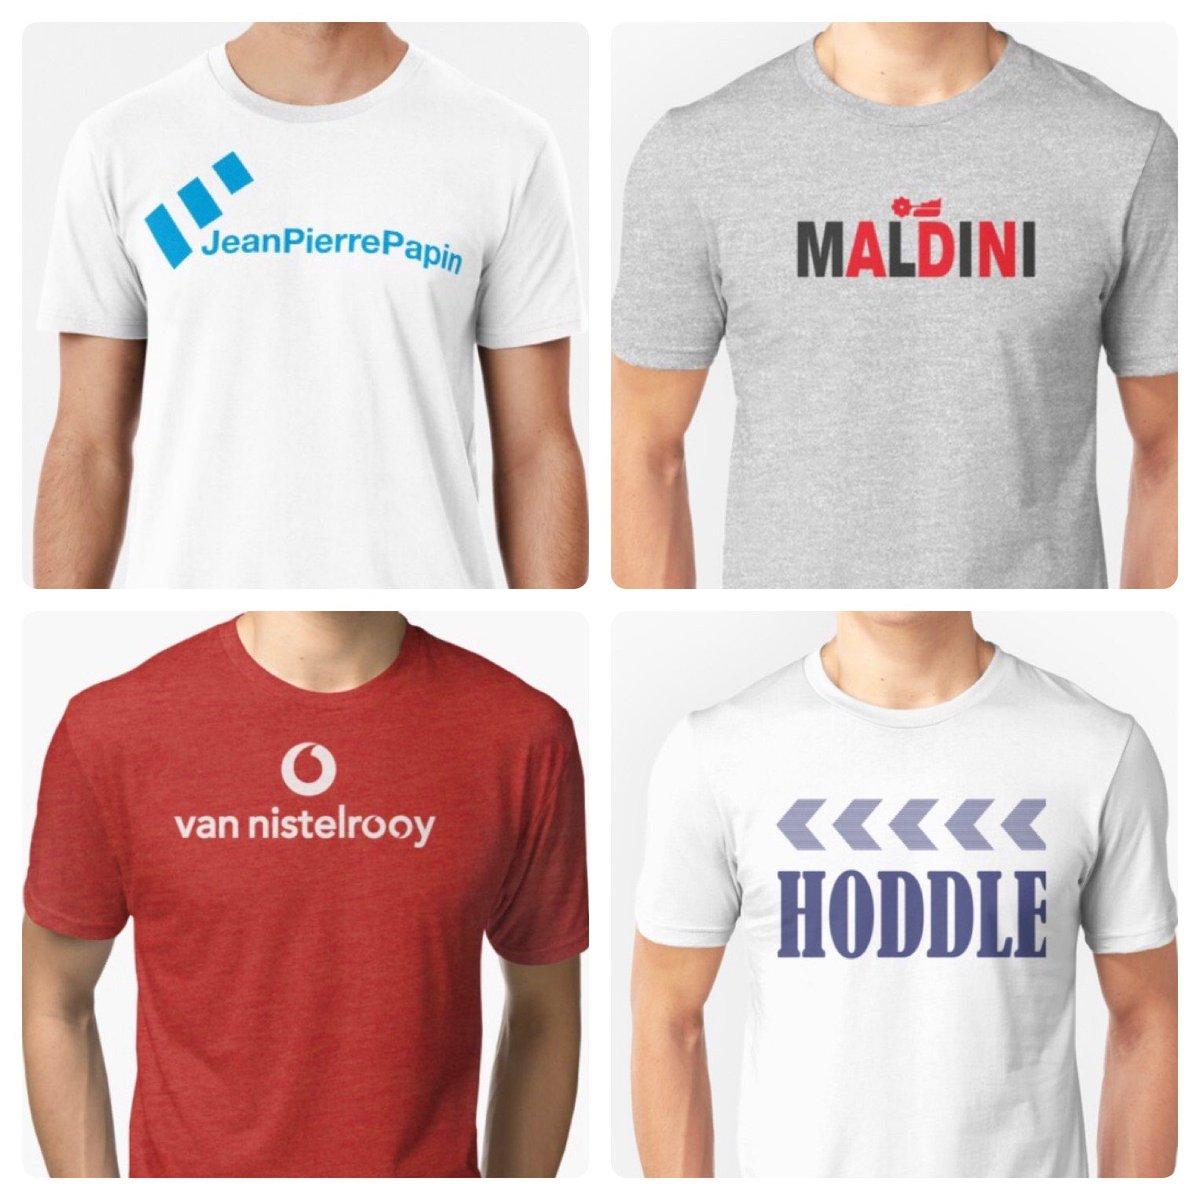 A few footie/brands legend player items on the shop today!!! 10% DISCOUNT CODE - IEARNEDIT  get your Brands stuff now!  #spurs #Marseille #acmilan #manutd  https://www.redbubble.com/people/BrandsintheAir/explore?asc=u…pic.twitter.com/7GyHQTaqs2